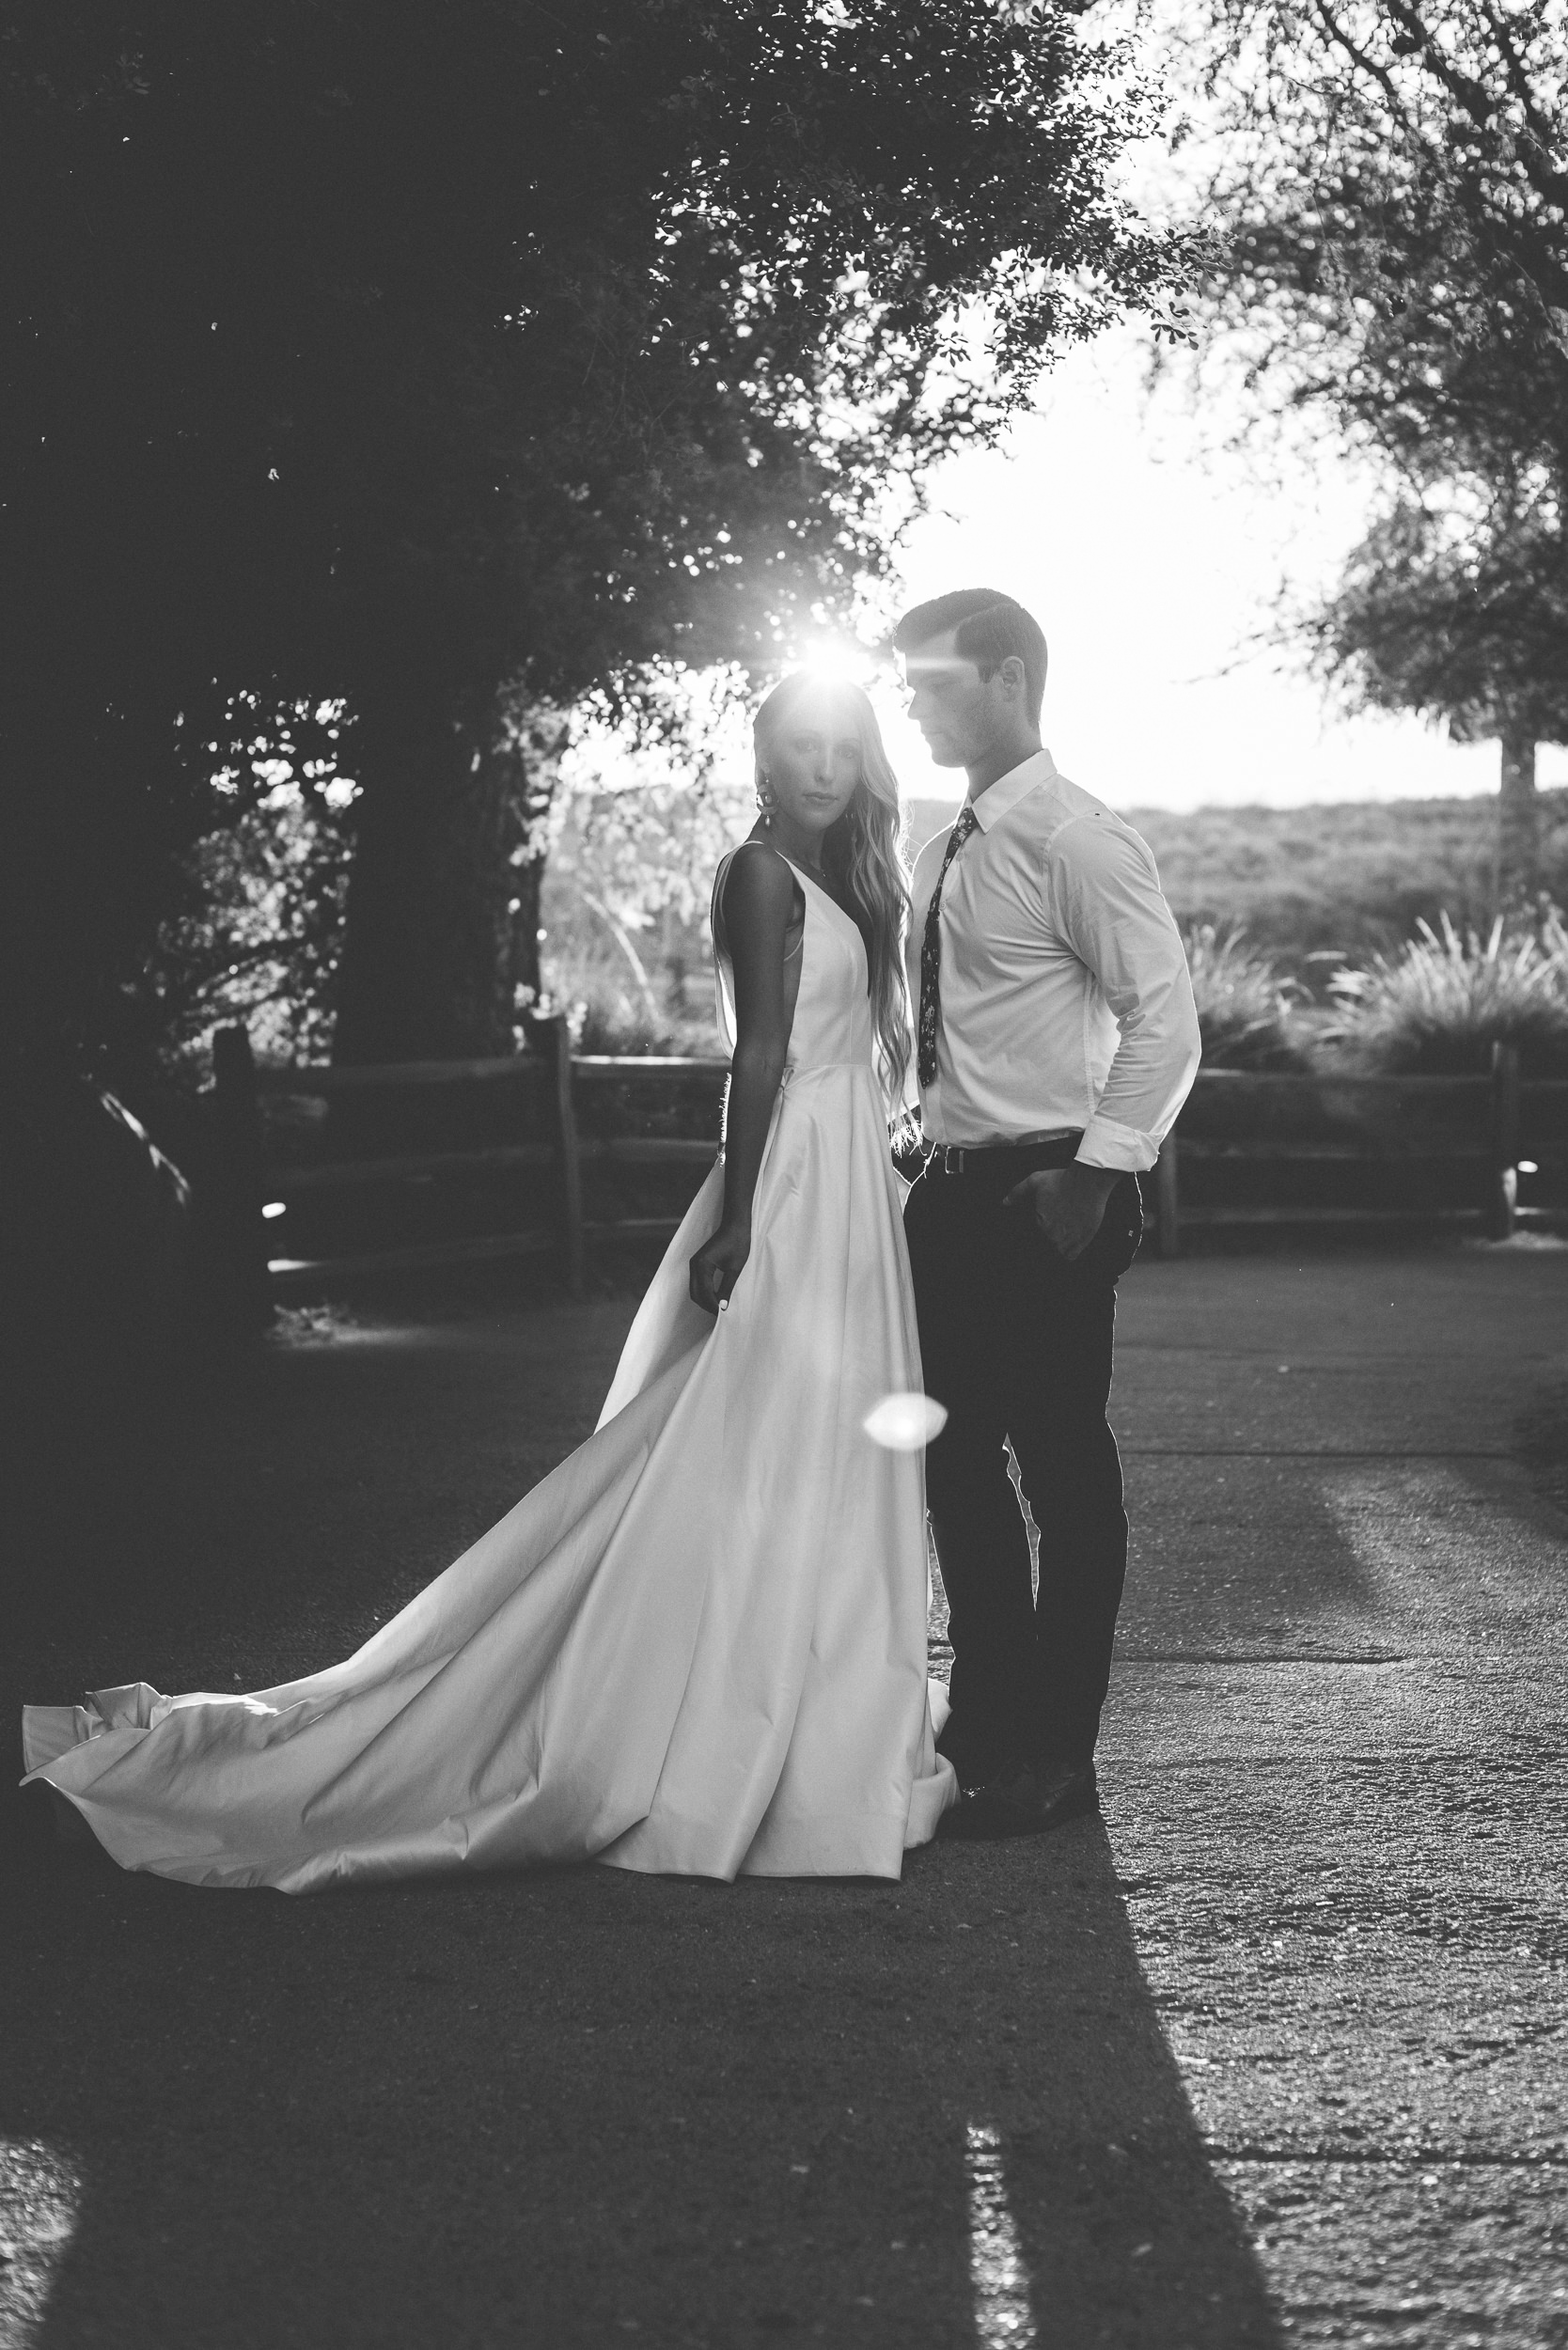 sChelsie + Chris - The Desert Shootout Wedding Romantics at The Living Desert-148.jpg